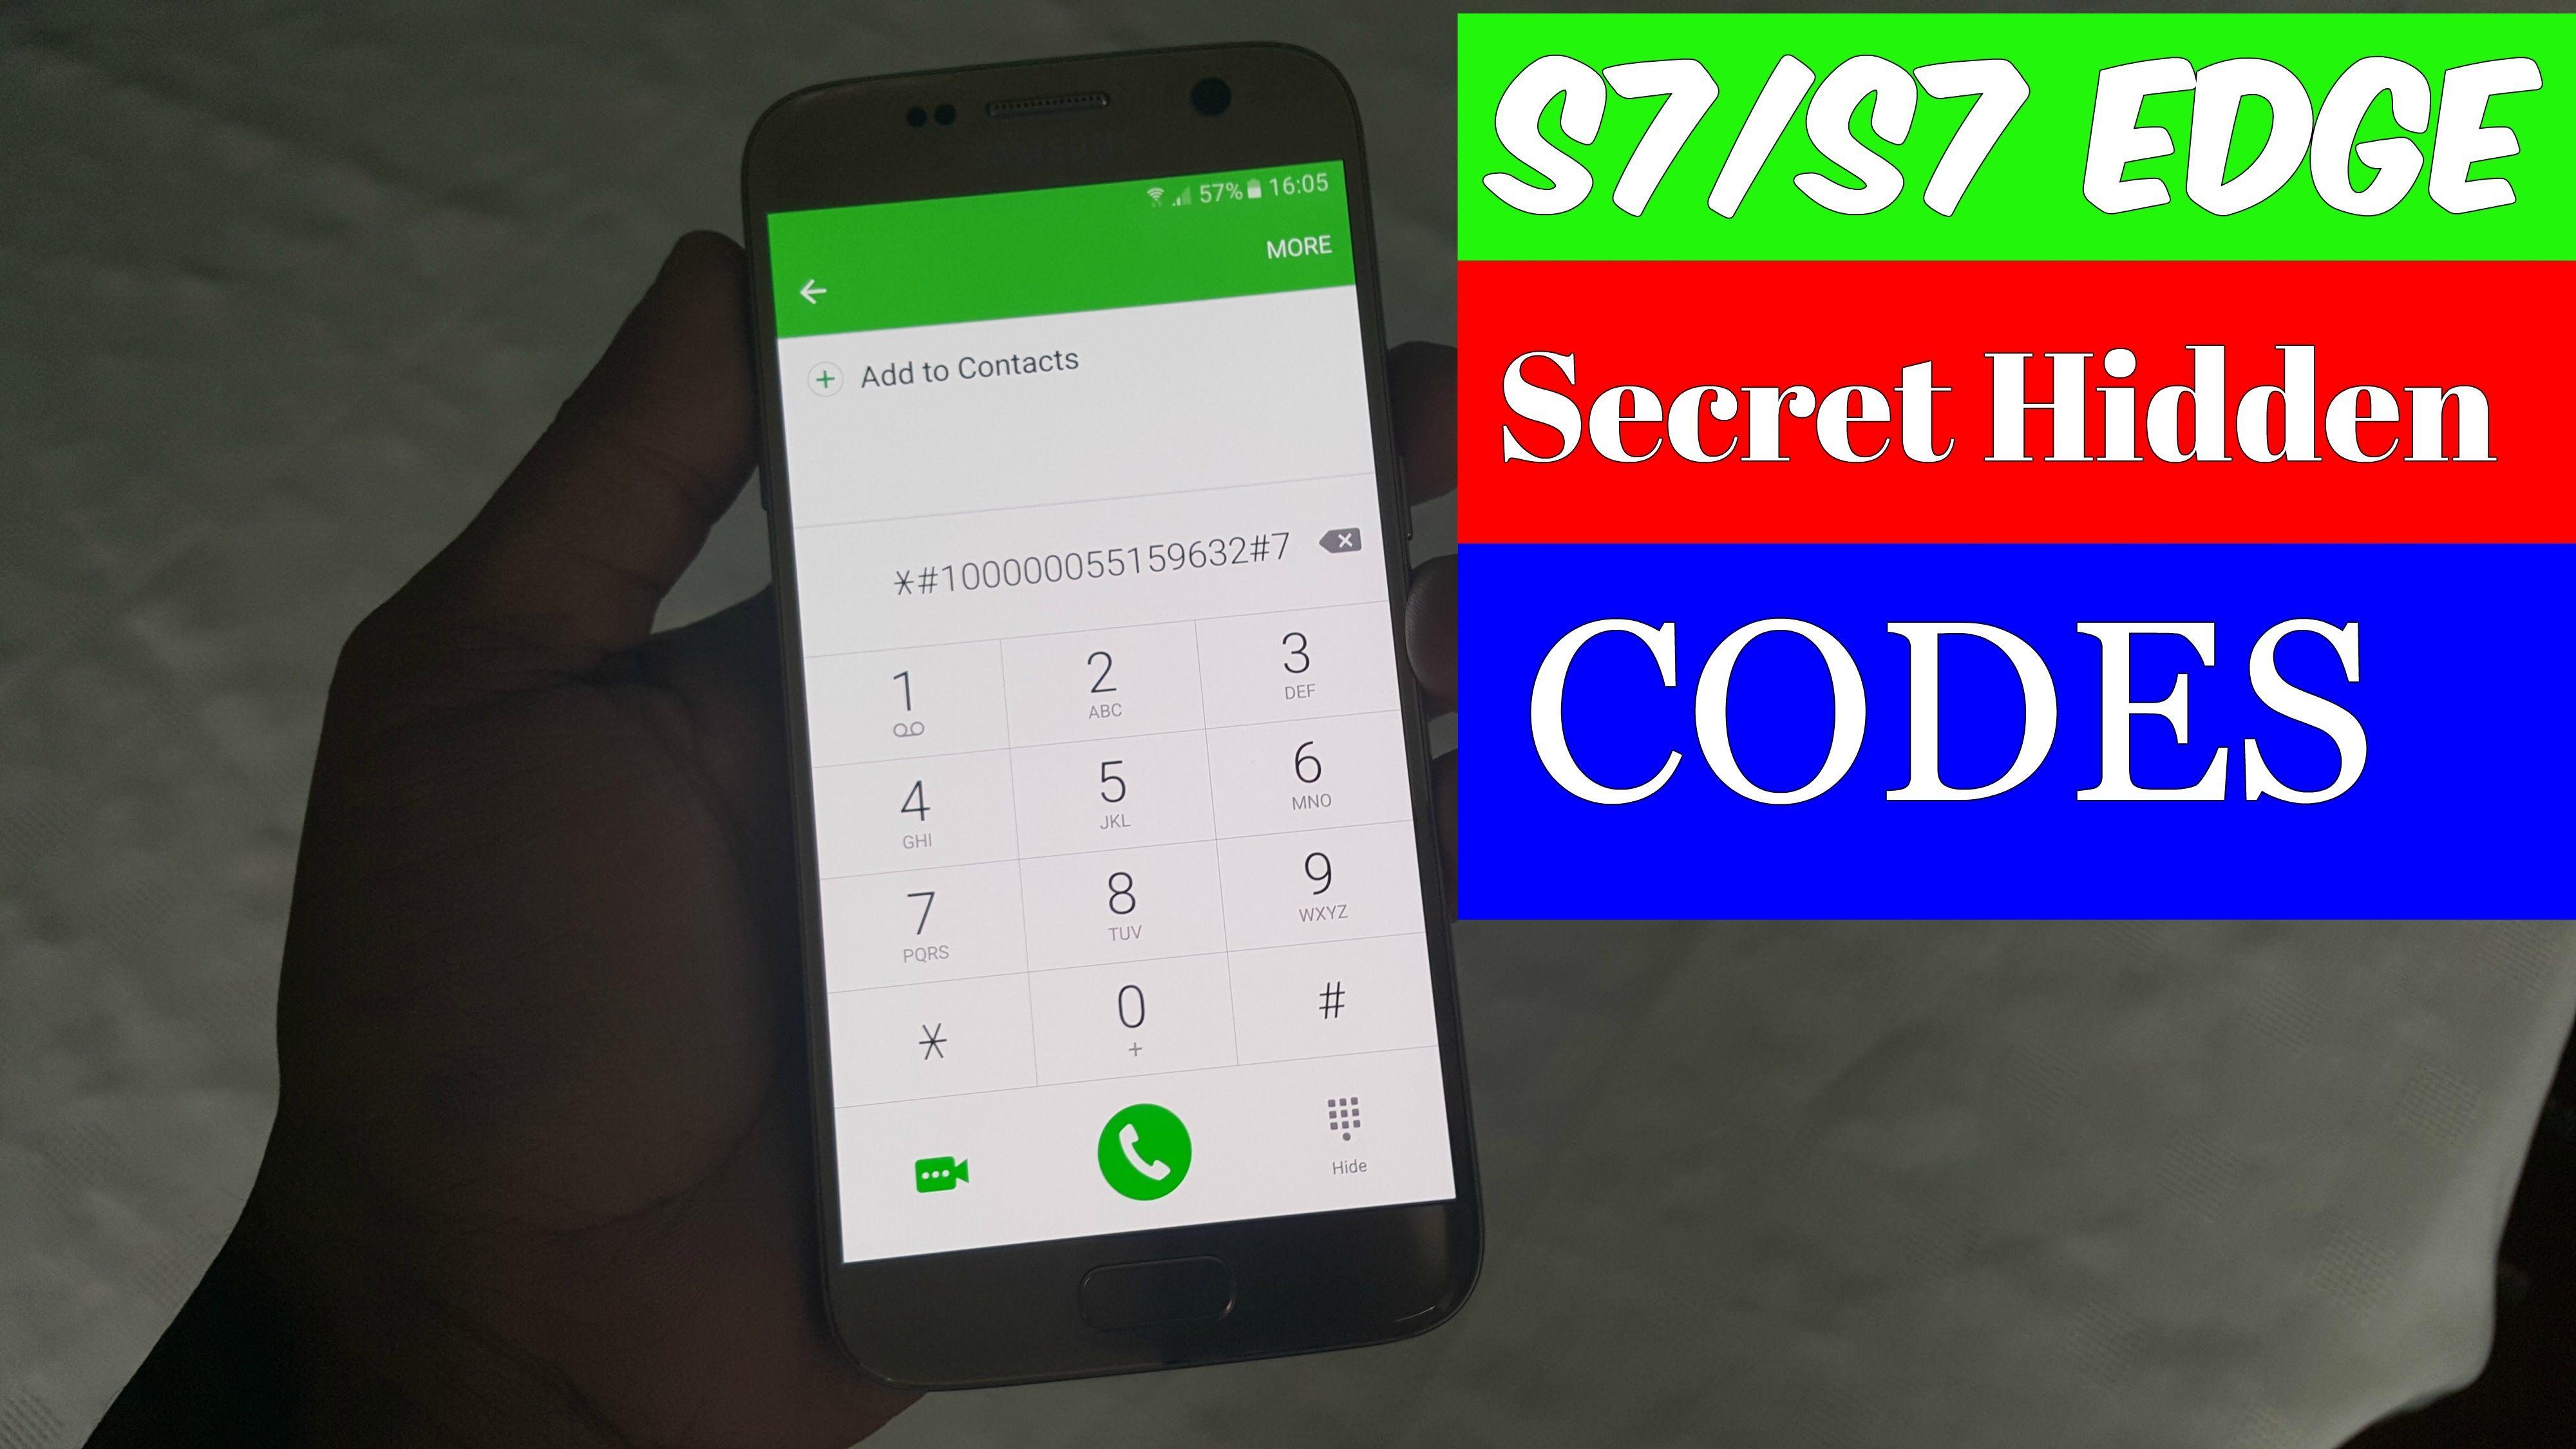 Samsung Galaxy S7 S7 Edge Secret Hidden Codes Tips Tricks Samsung Galaxy S7 Samsung Galaxy Galaxy